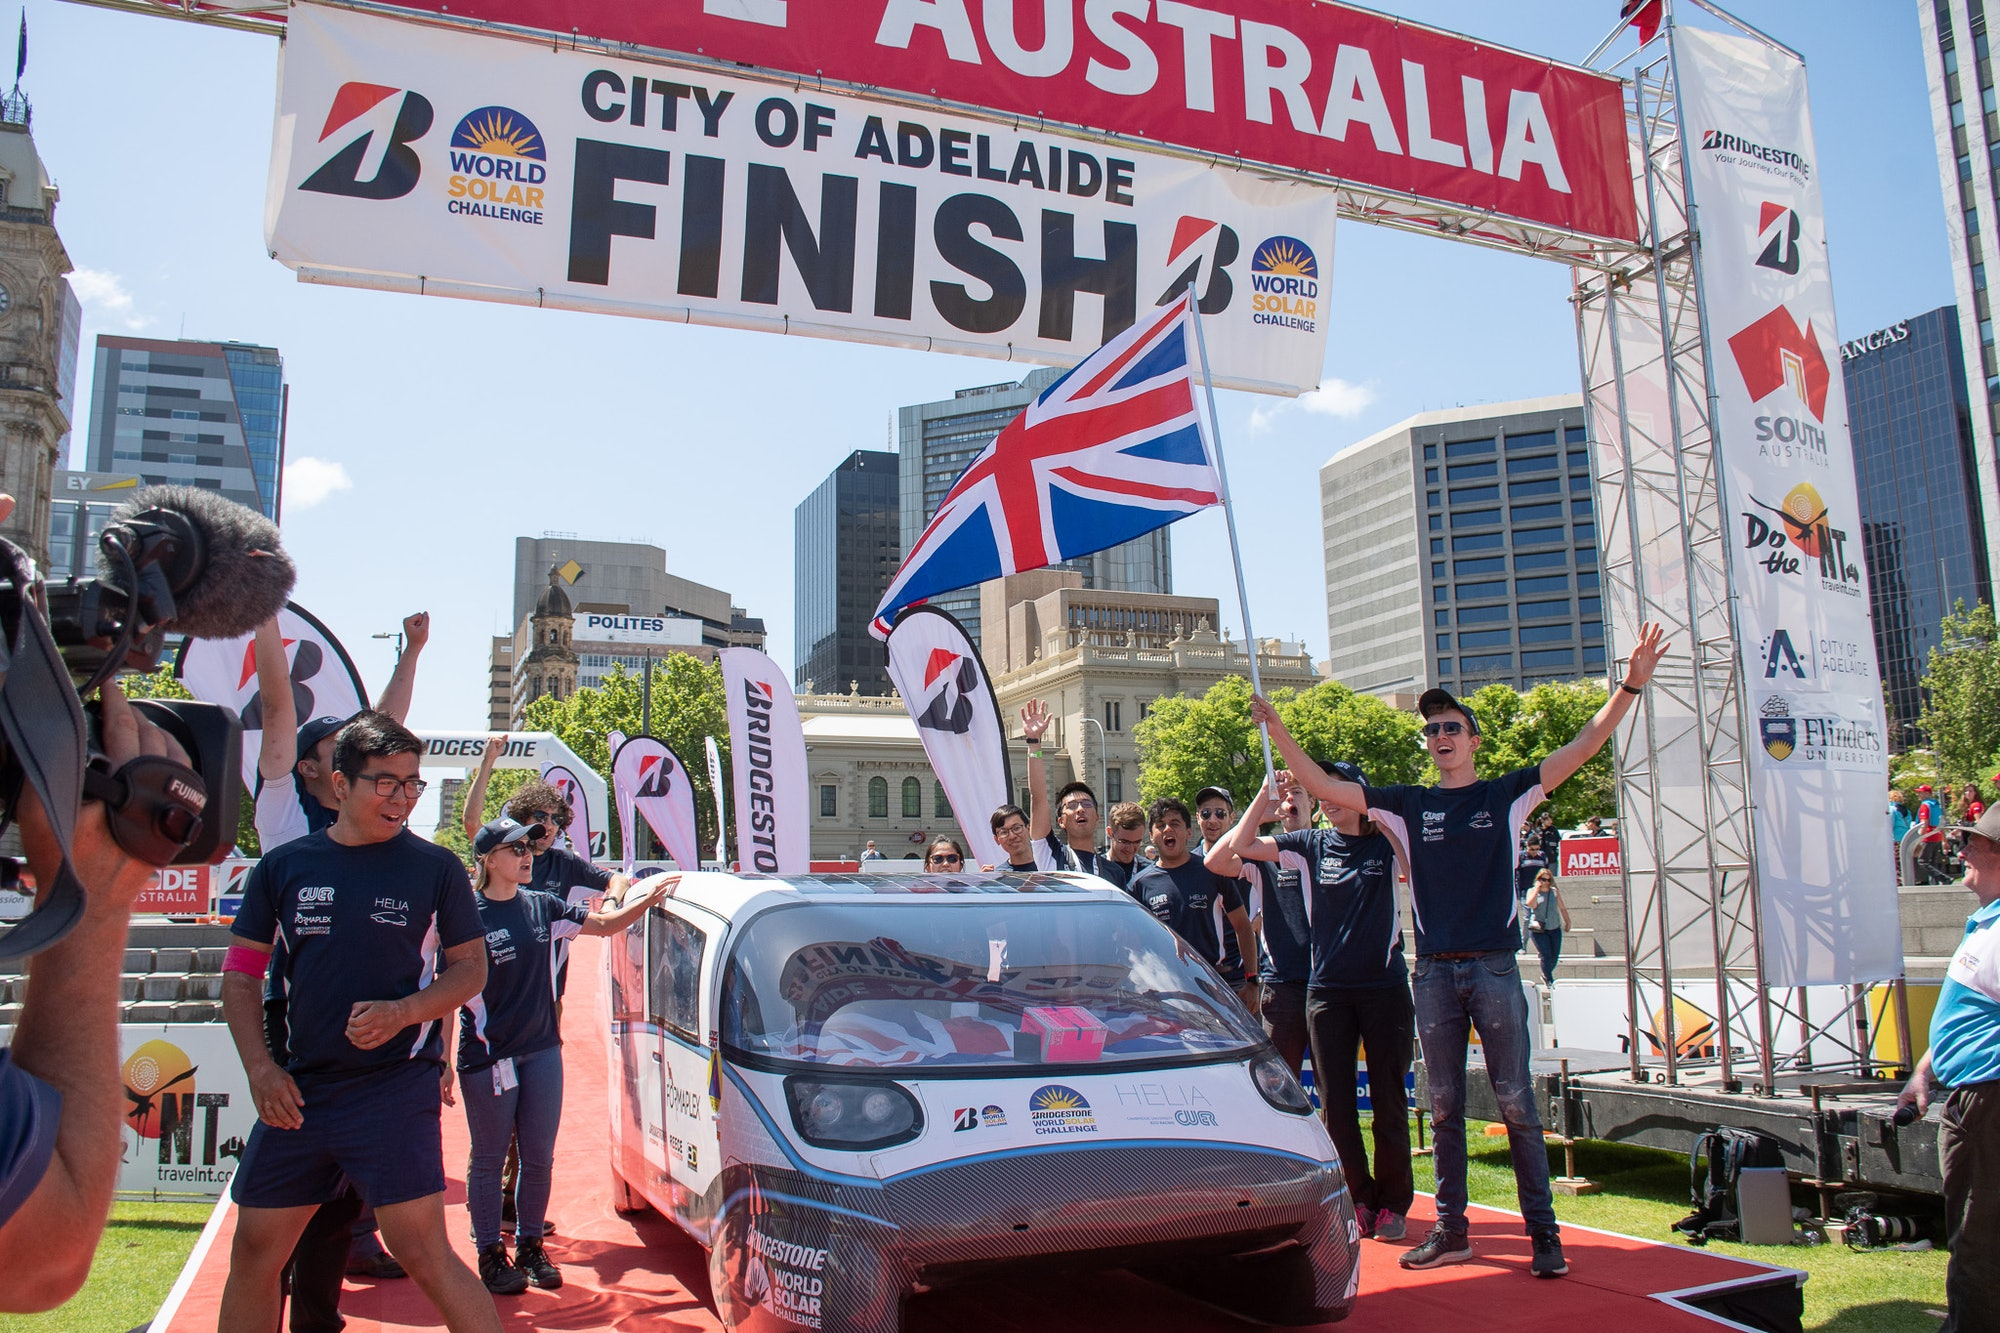 Helia at the Australia finish line.